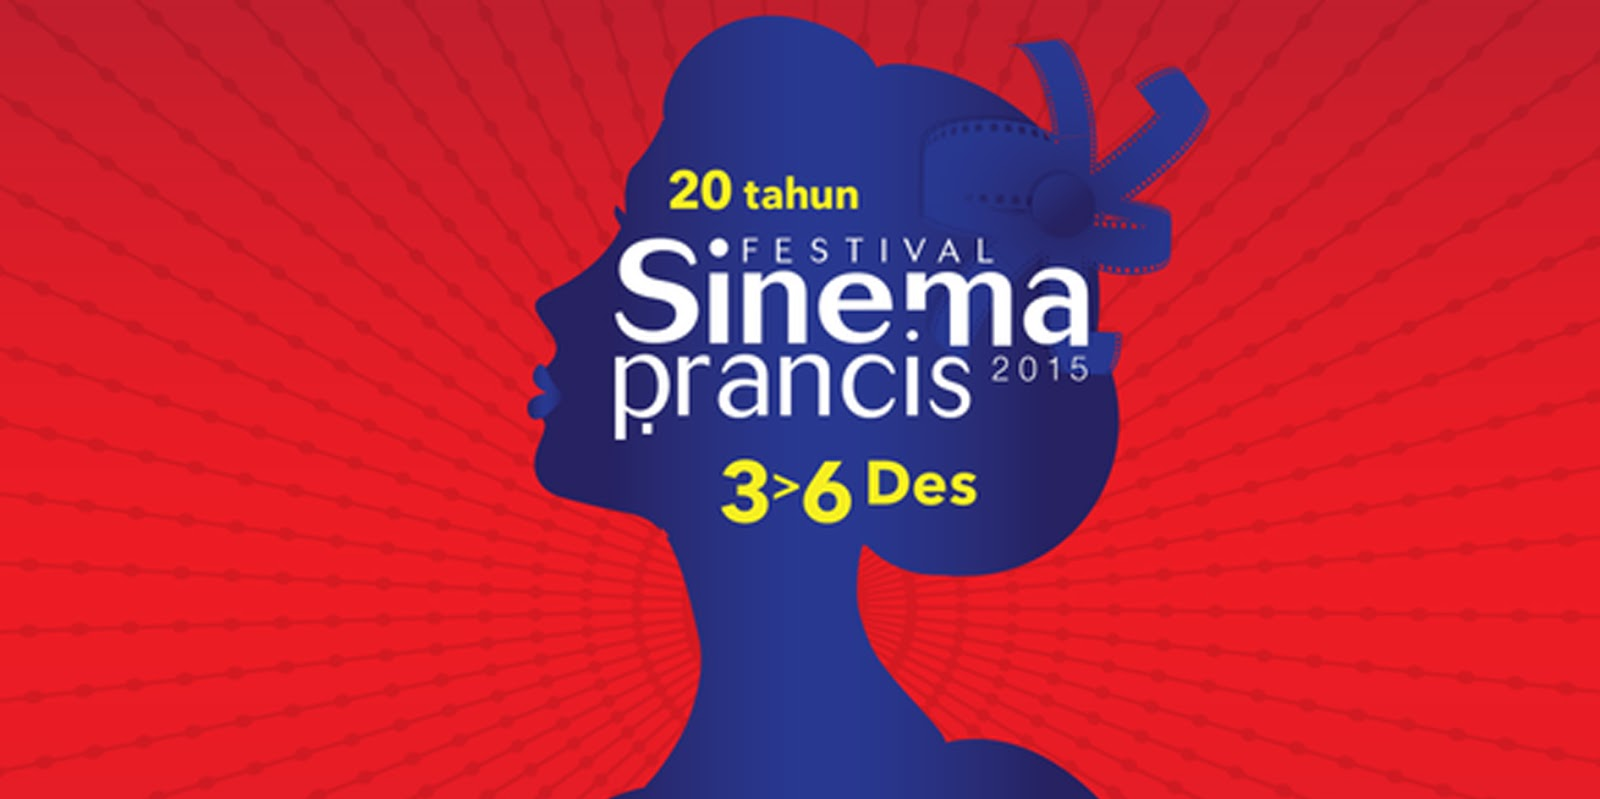 Festival Film Perancis 3-6 Desember di Bandung